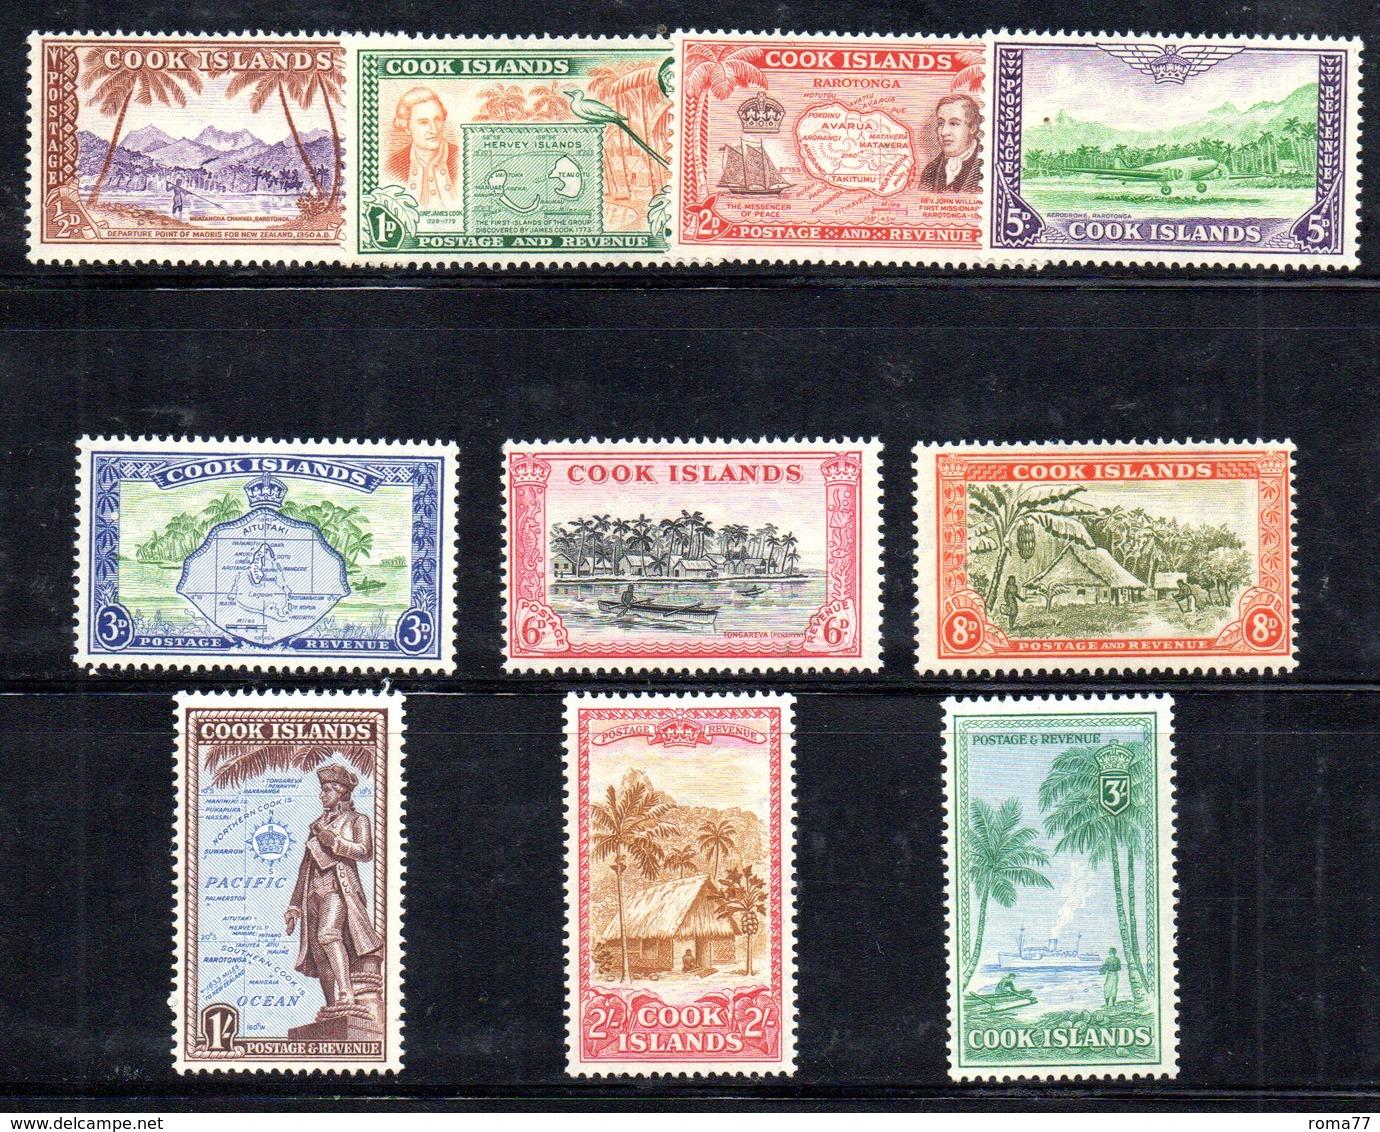 W2974 - COOK ISLANDS 1949 ,  Yvert 76/85  ***  MNH  ORDINARIA - Cook